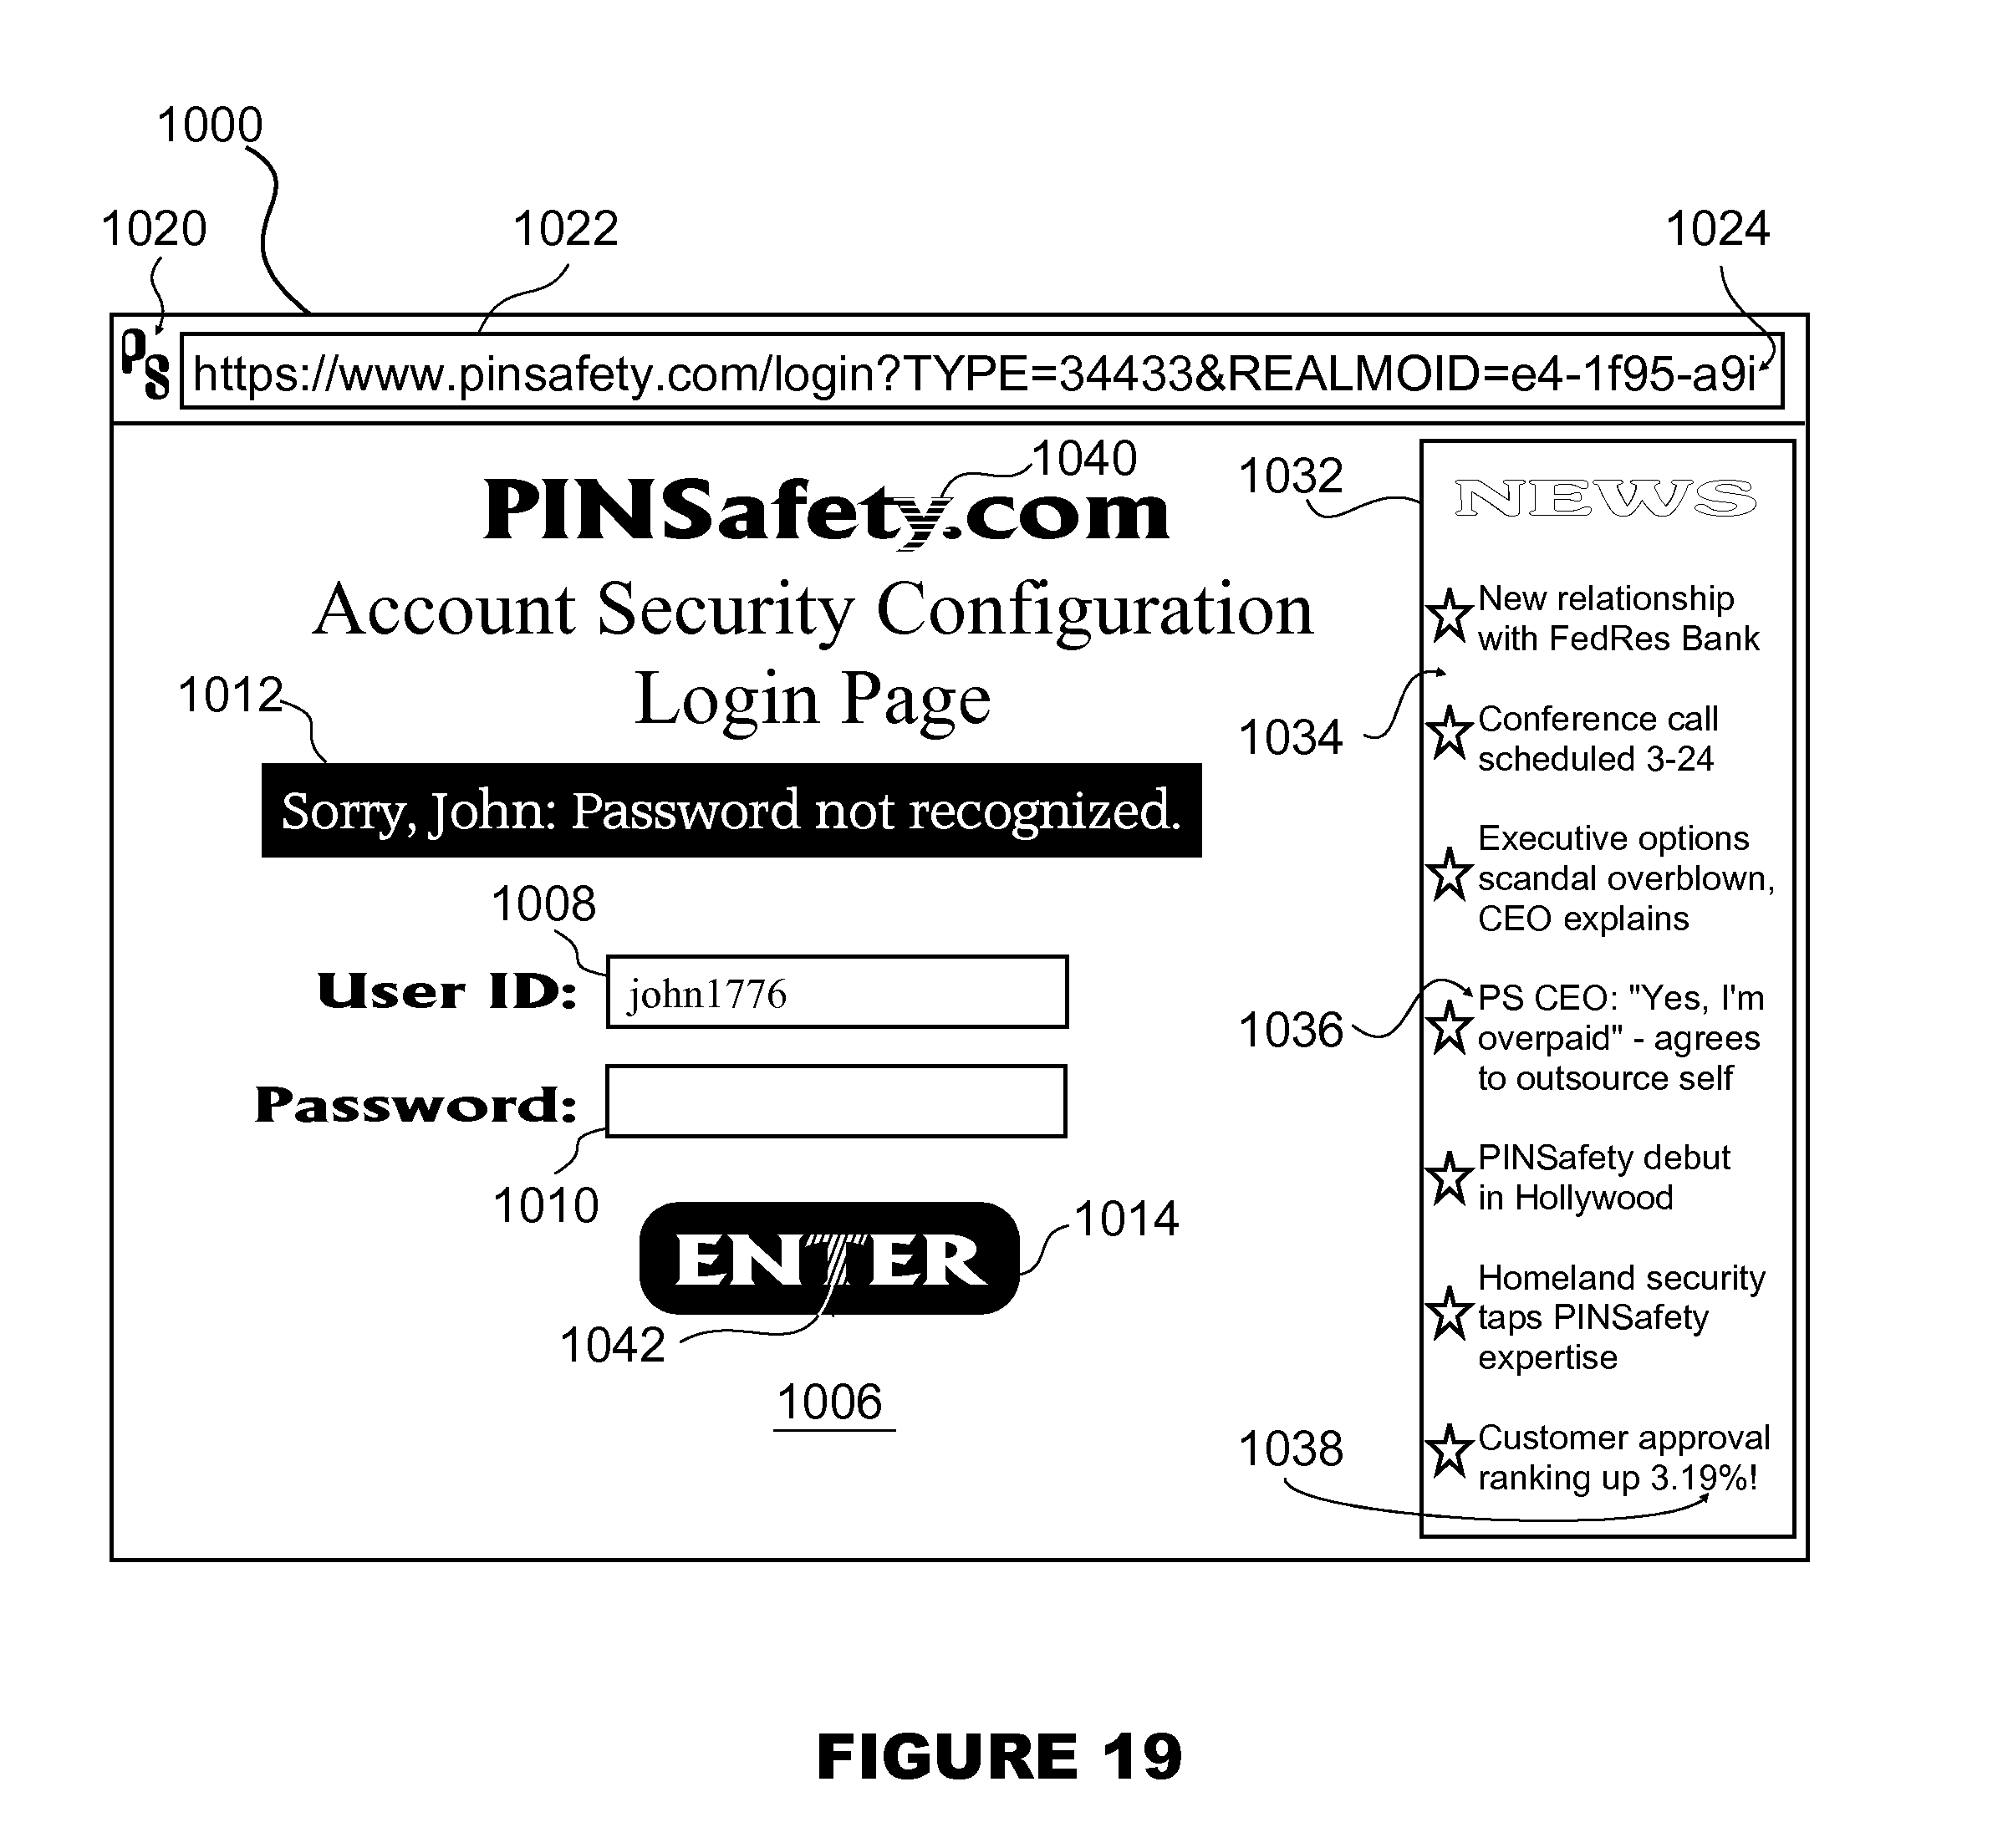 Patent US 7,552,467 B2